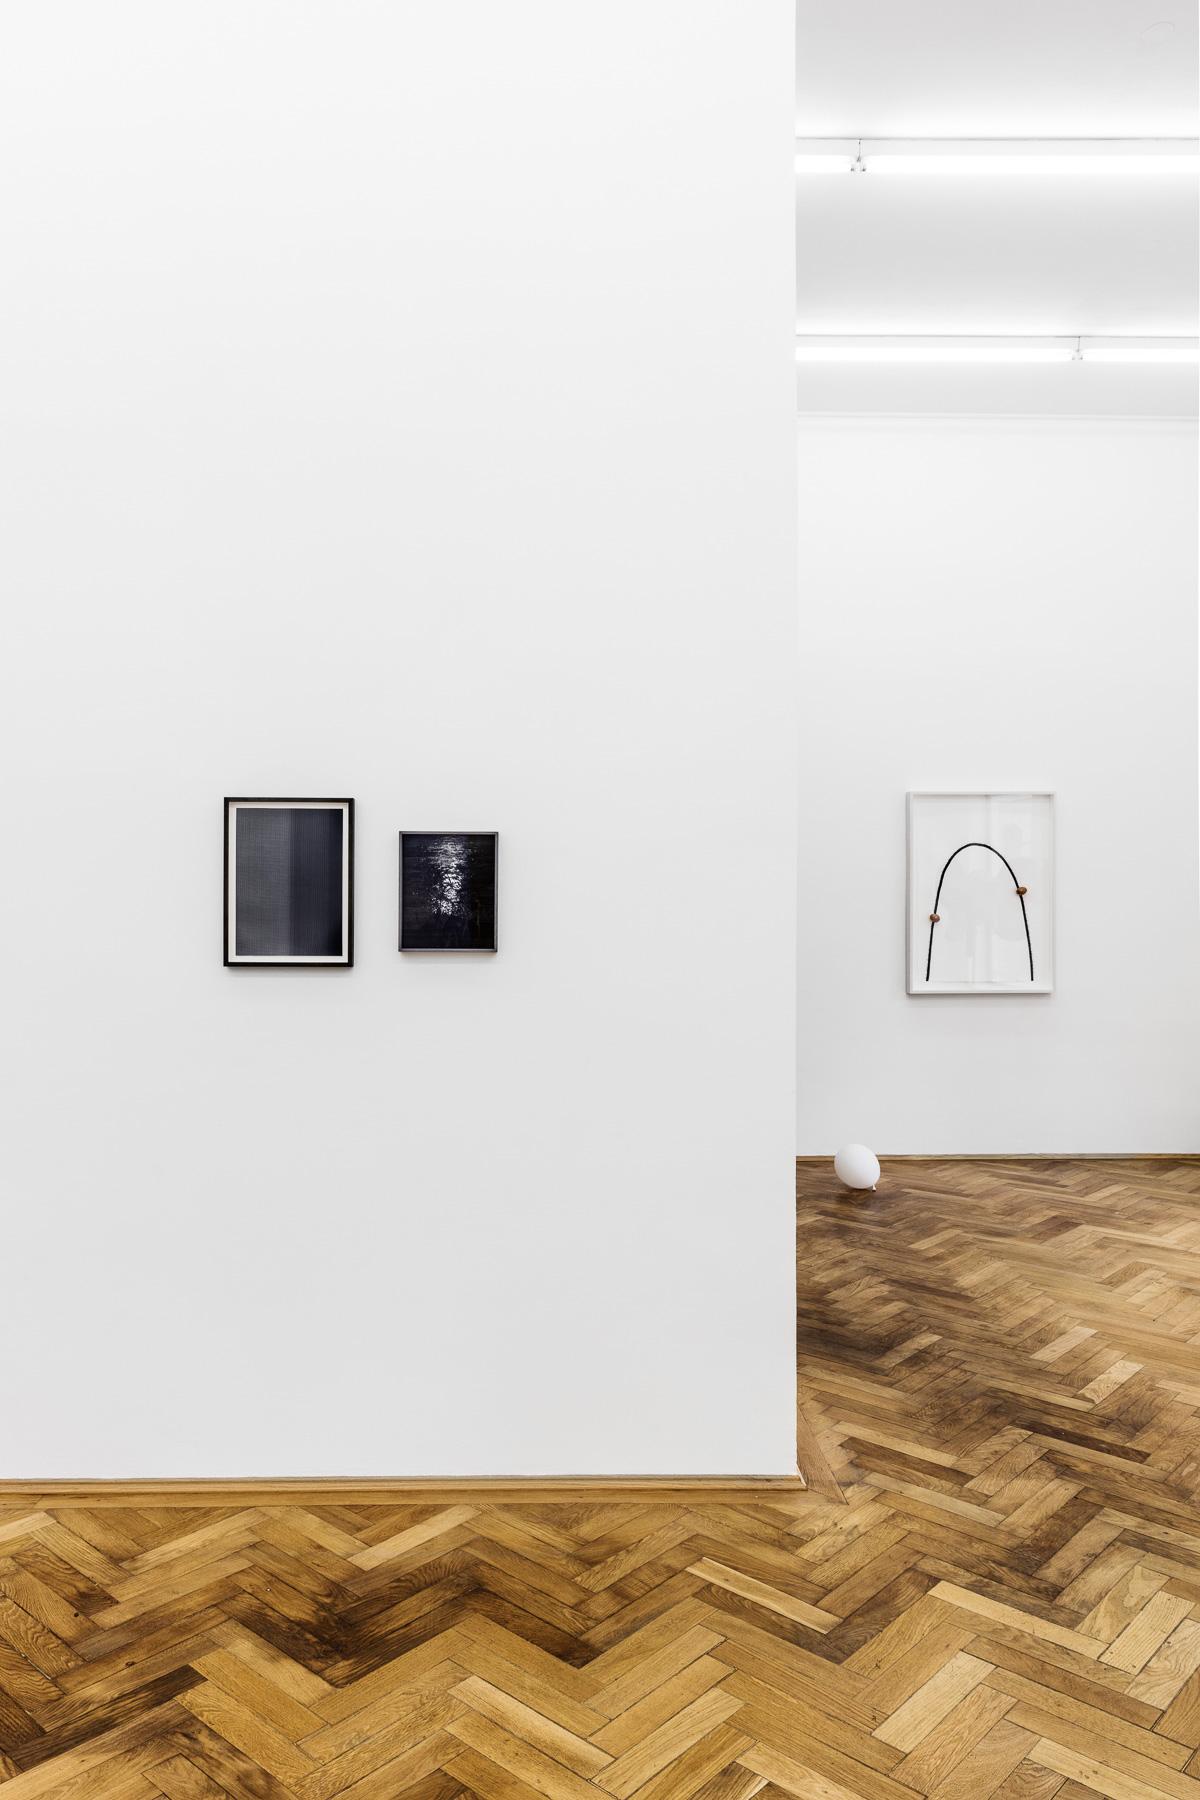 Two To Tango, installation view